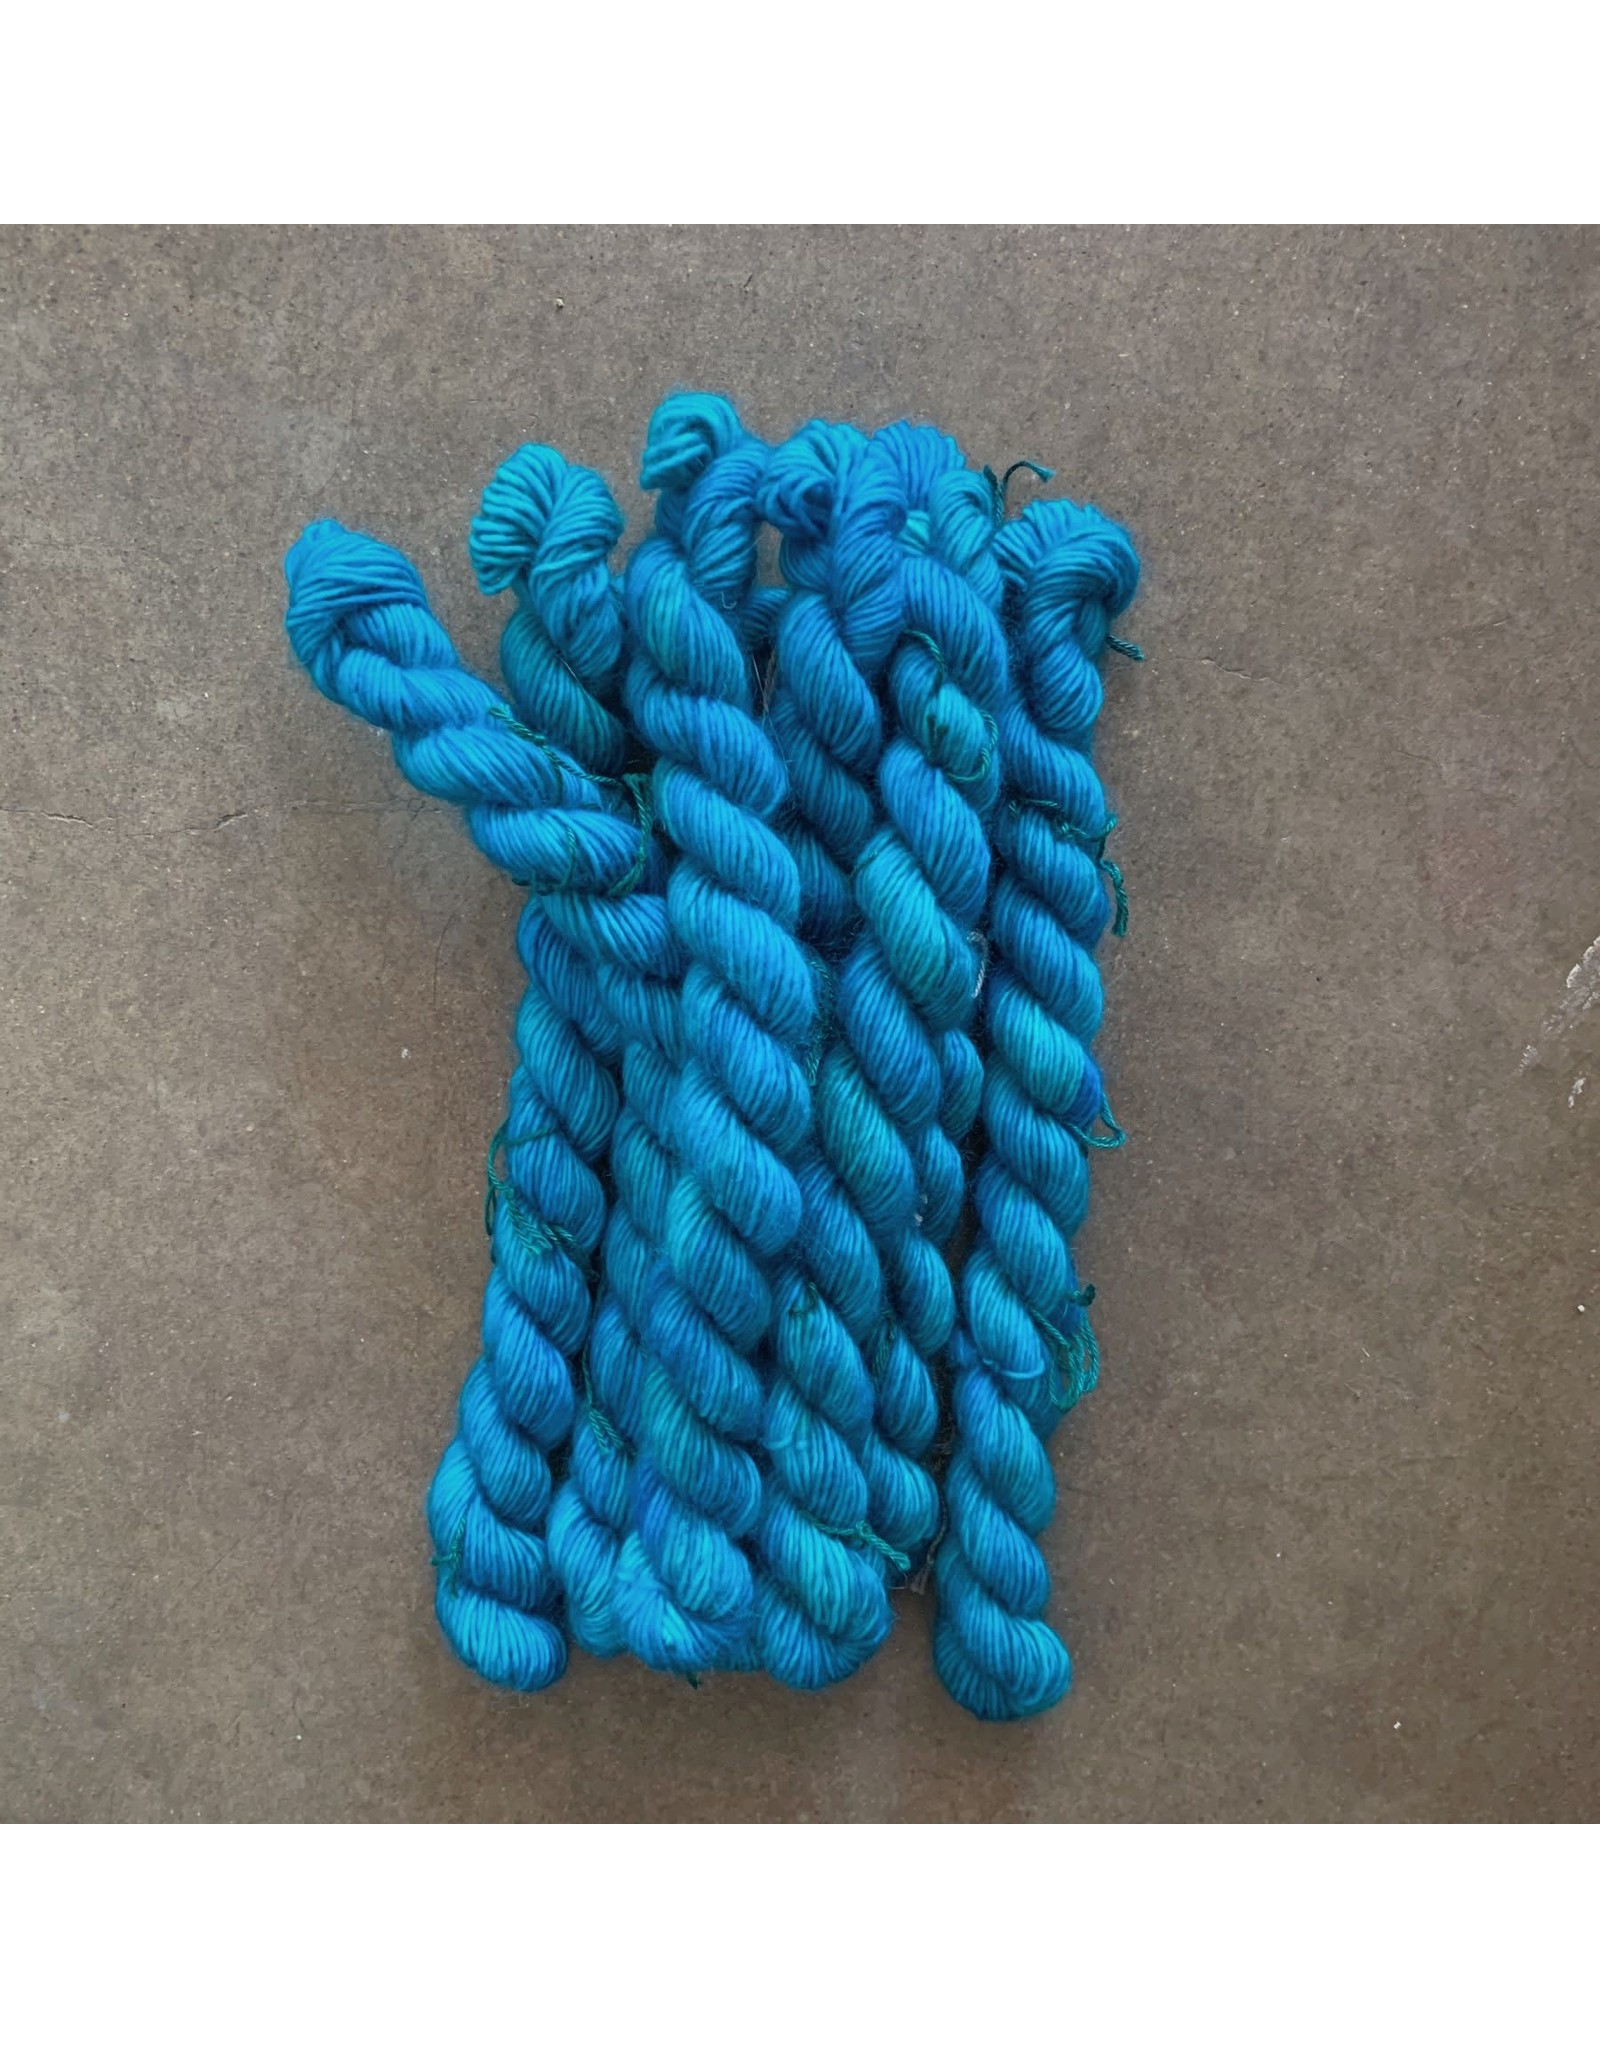 Nassau Blue - Unicorn Tails - Madelinetosh